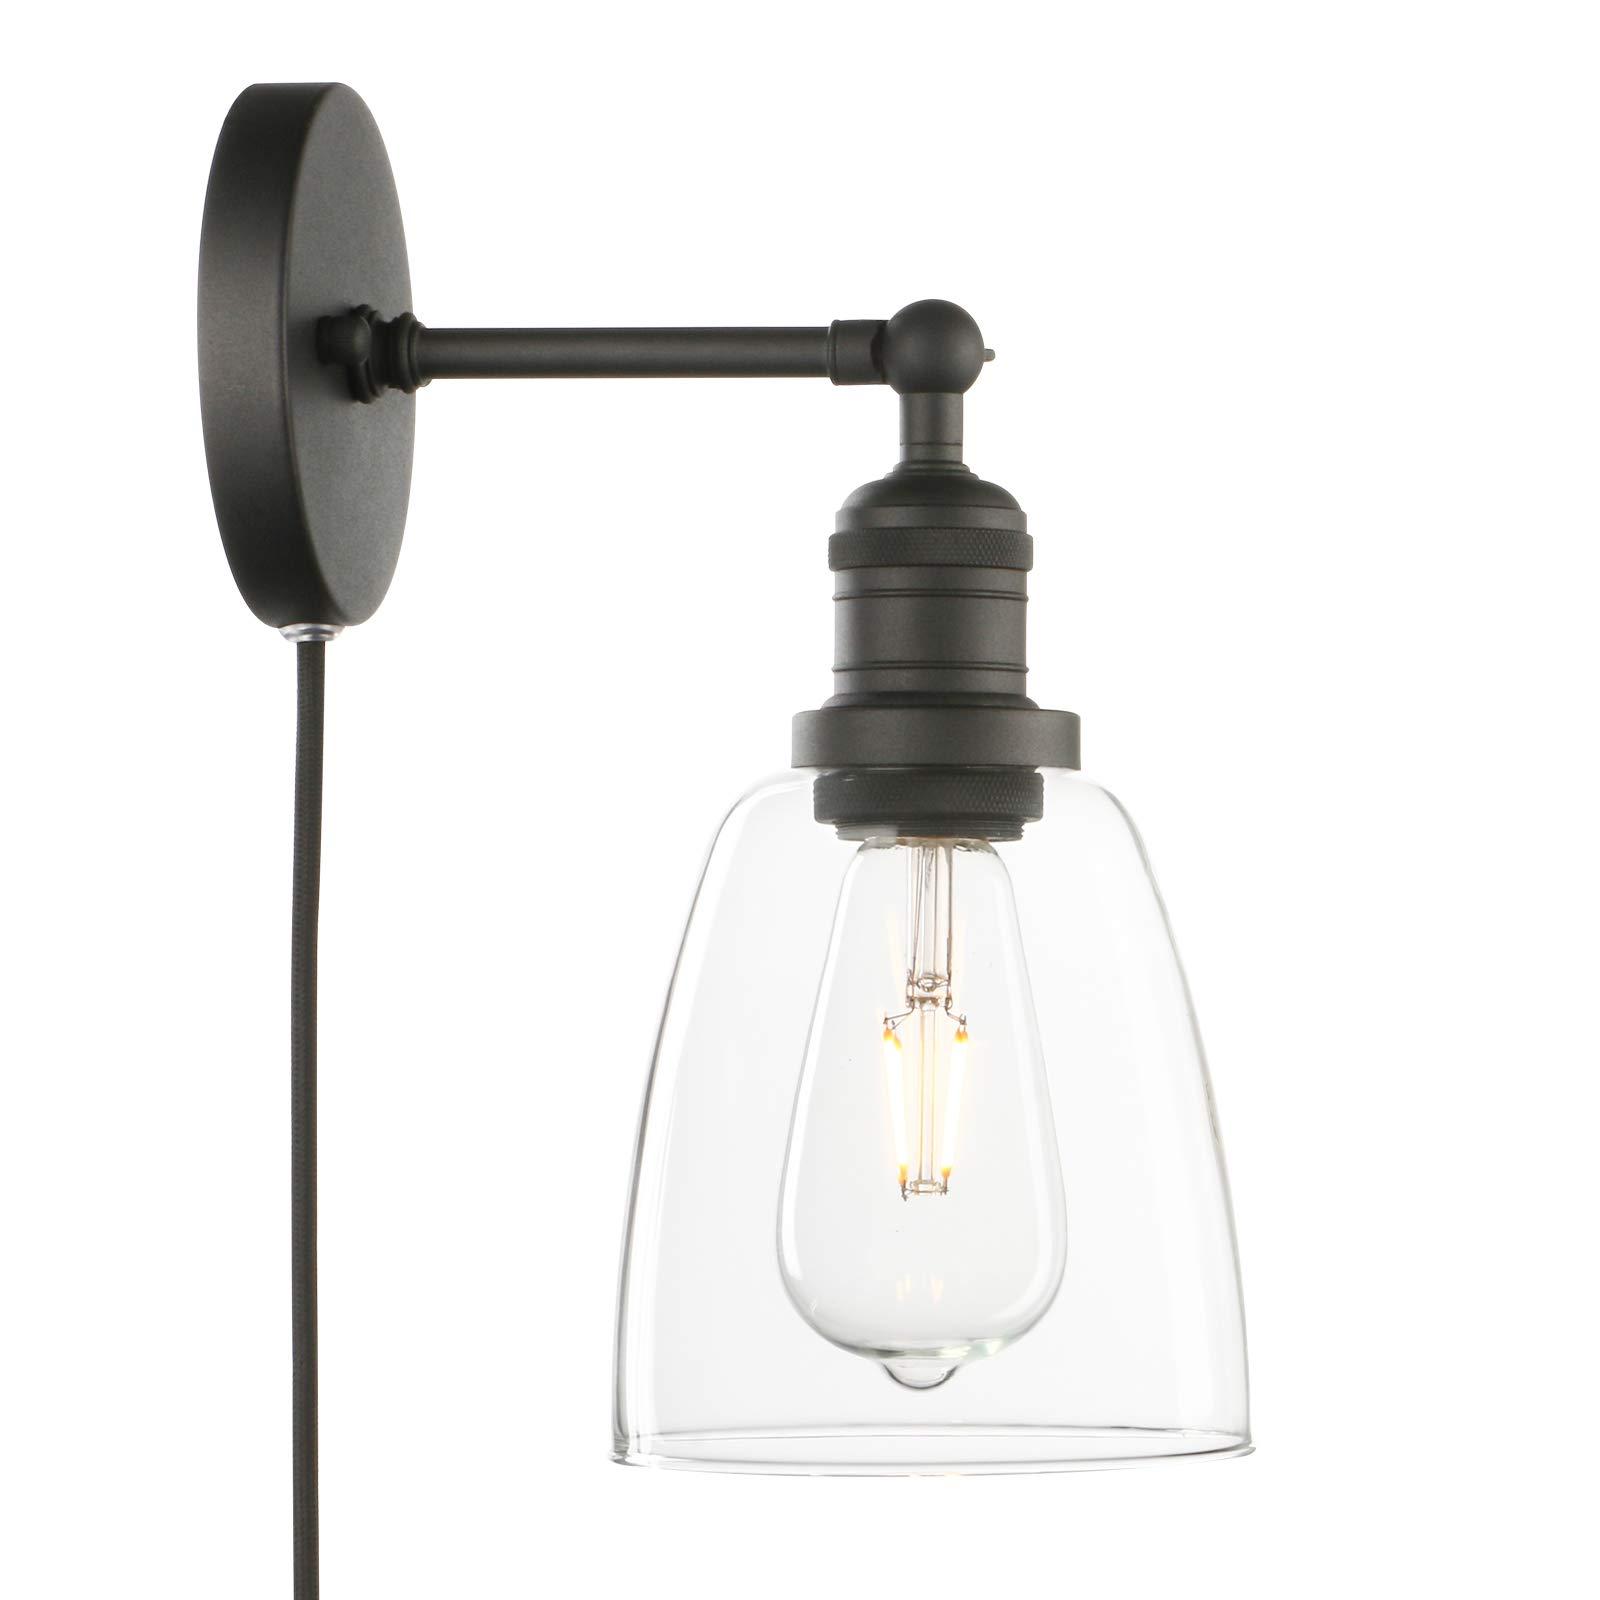 Phansthy Bathroom Vanity Light Matte Black Plug In Wall Sconce With 5 5 Inch Clear Glass Light Shade Buy Online In Aruba At Aruba Desertcart Com Productid 187379362